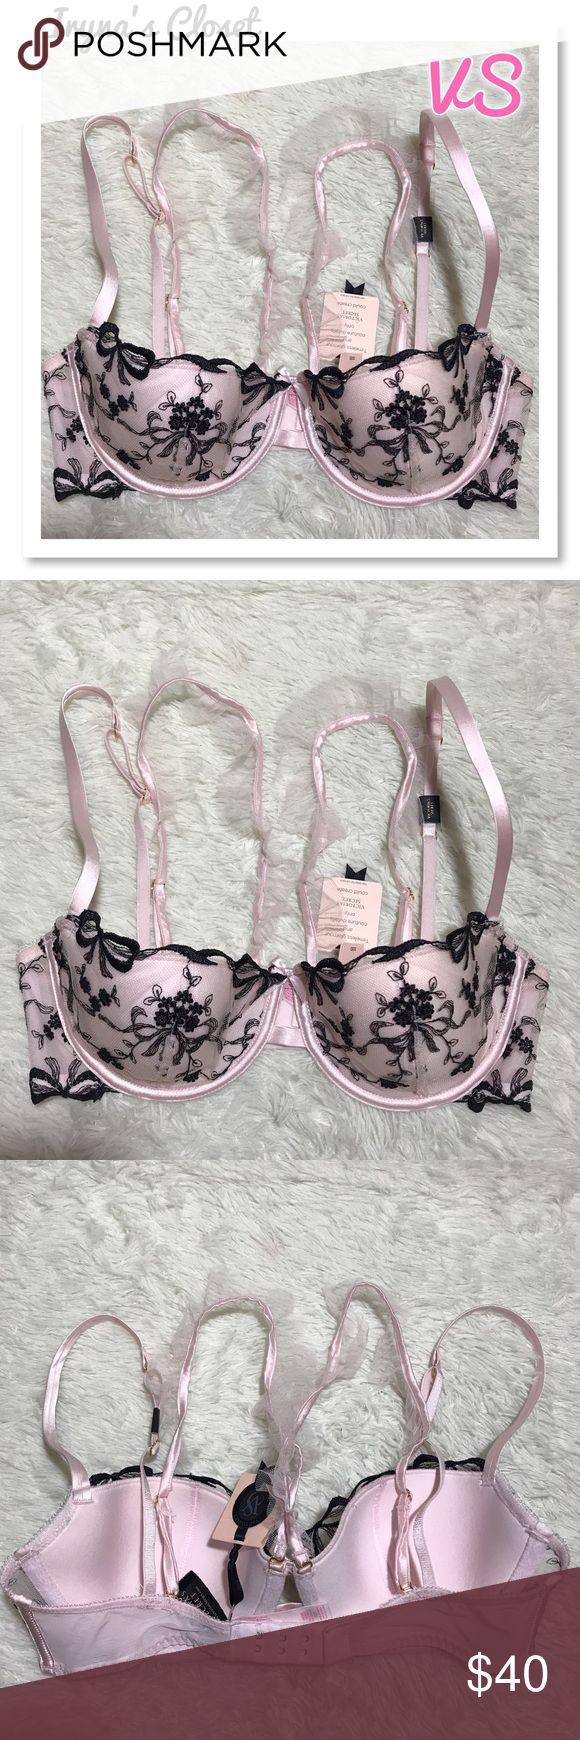 VS 32D Designer Collection Balconet Bra Lightly lined Victoria's Secret Intimates & Sleepwear Bras